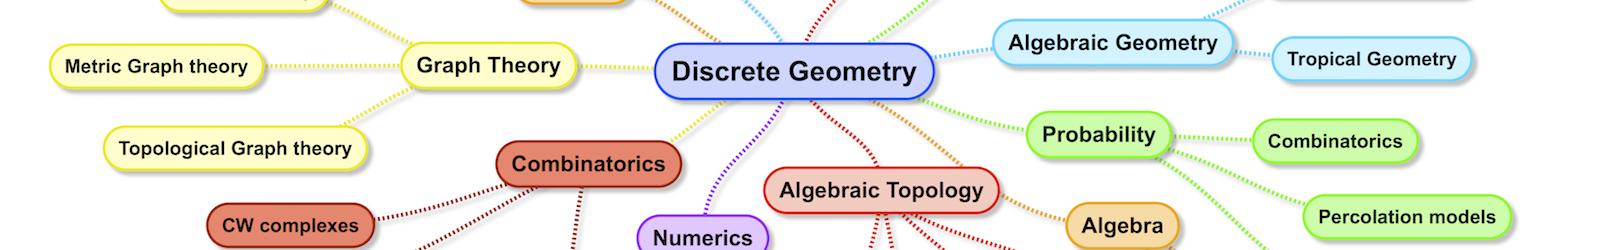 Aspects of Discrete Geometry